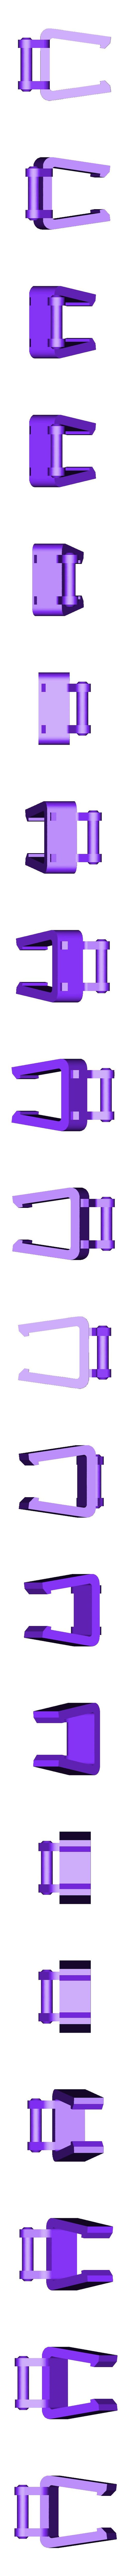 LegT1_Right_07_OliveGreen.stl Download STL file Heavy Gun Walker • 3D print design, Jwoong